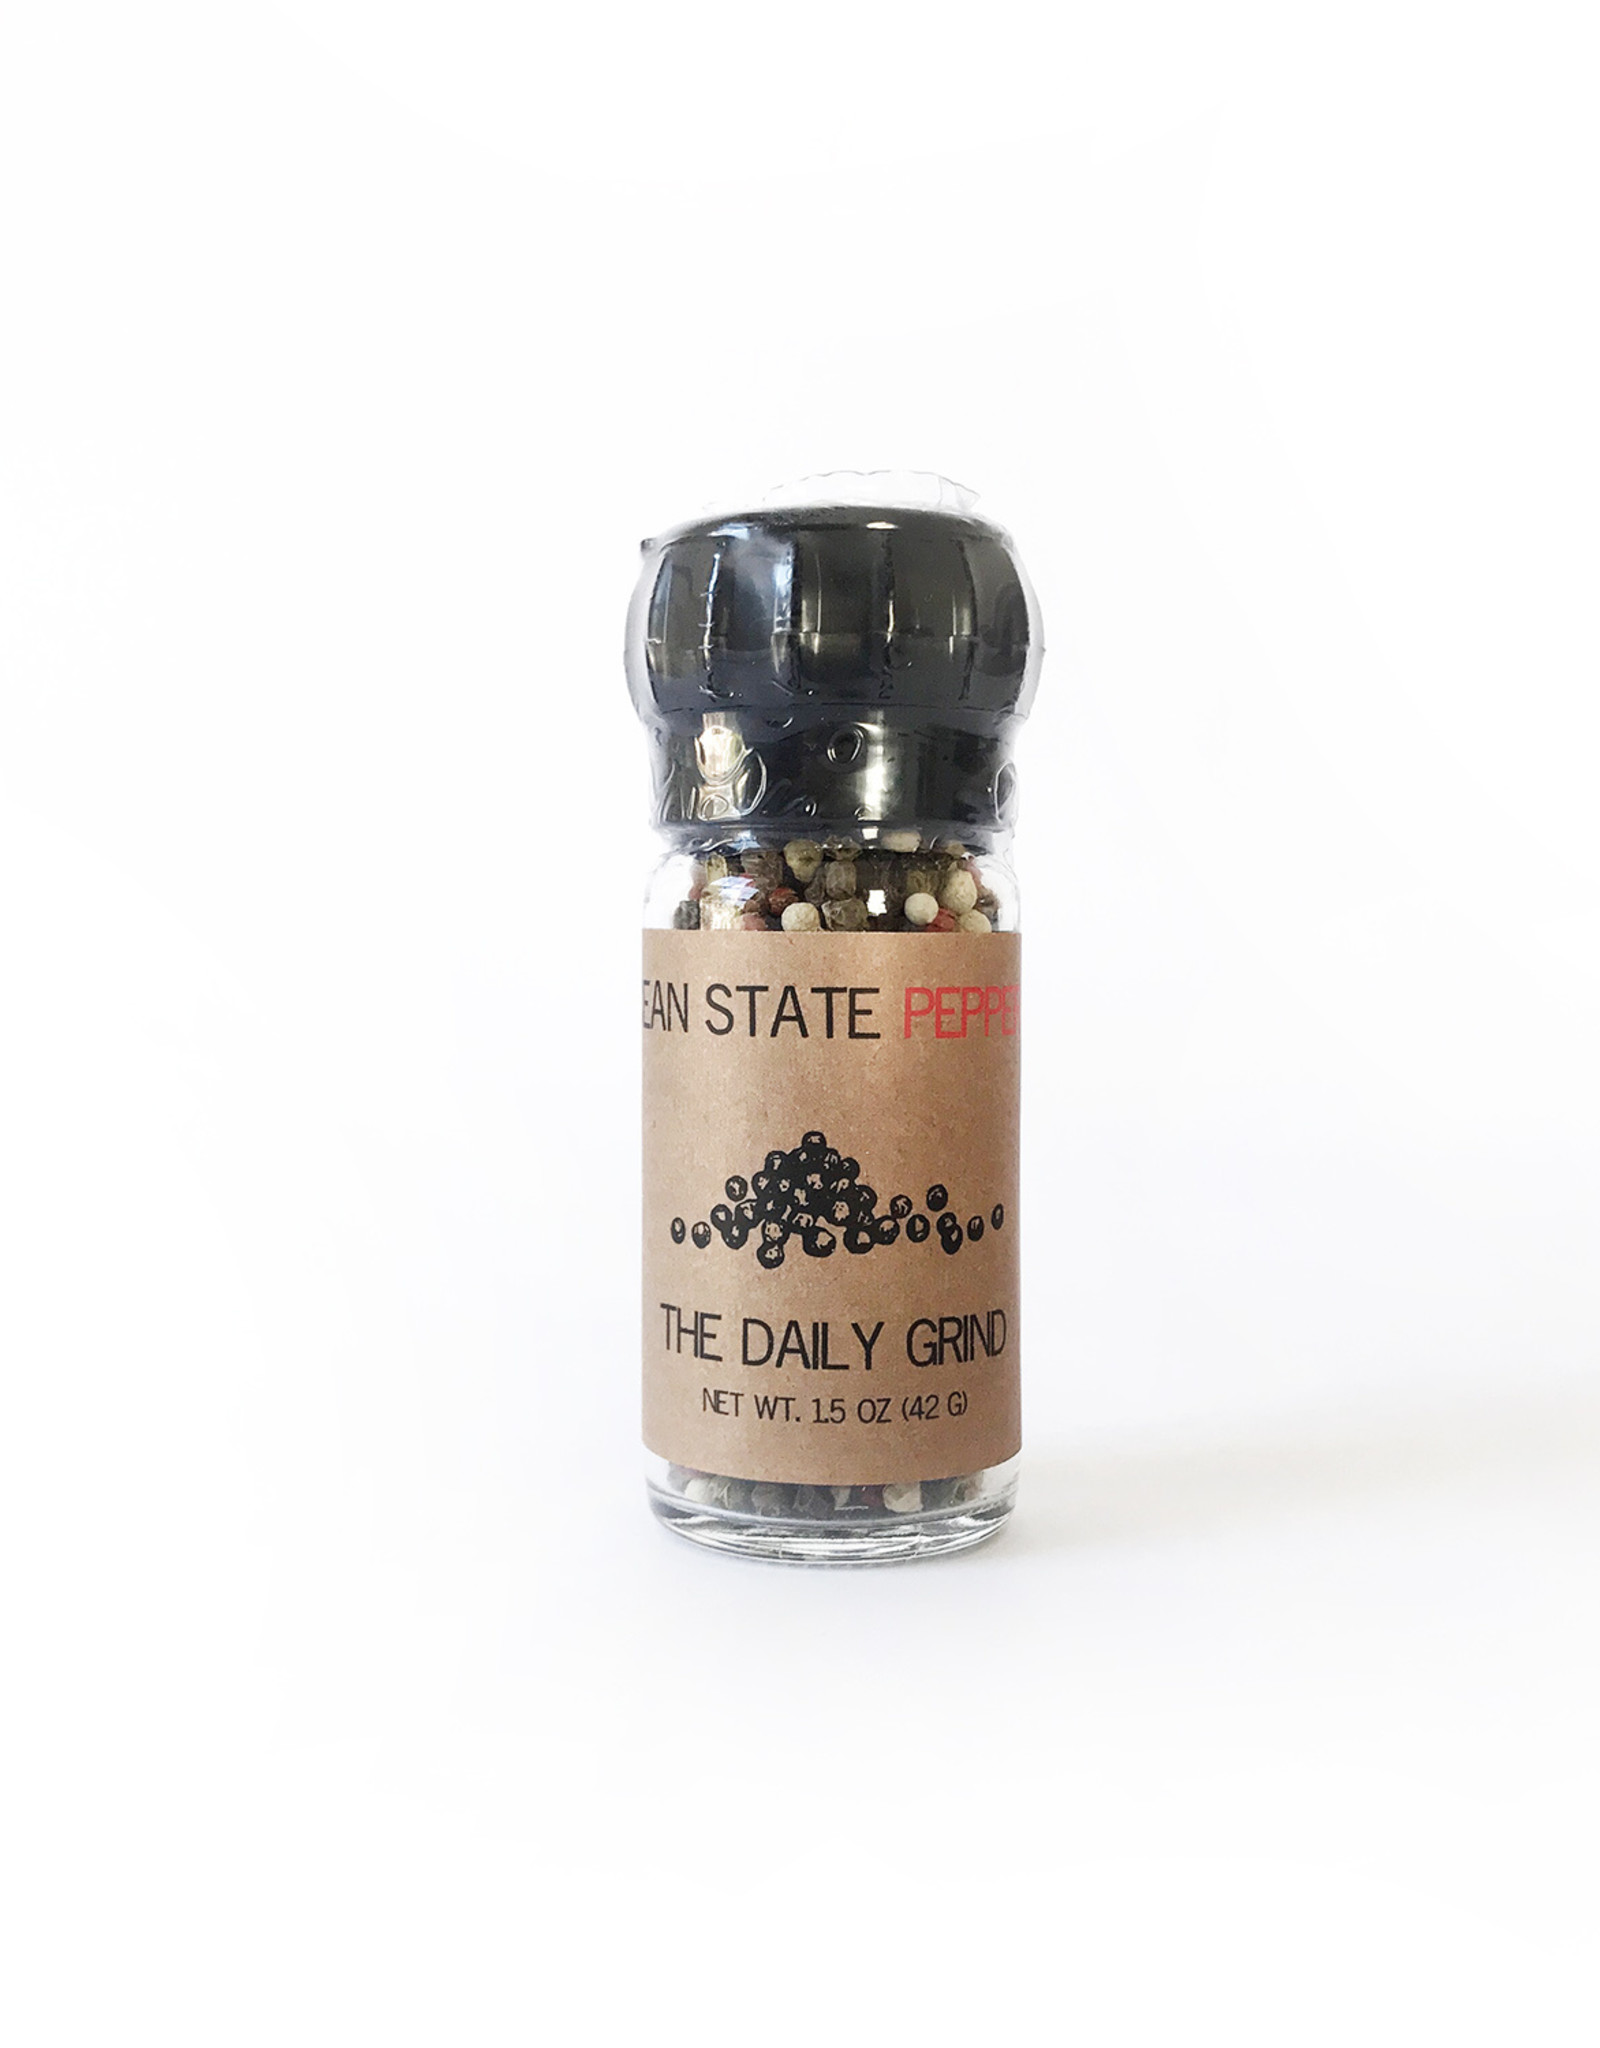 Ocean State Pepper Co. Ocean State Pepper Co. The Daily Grind Pepper